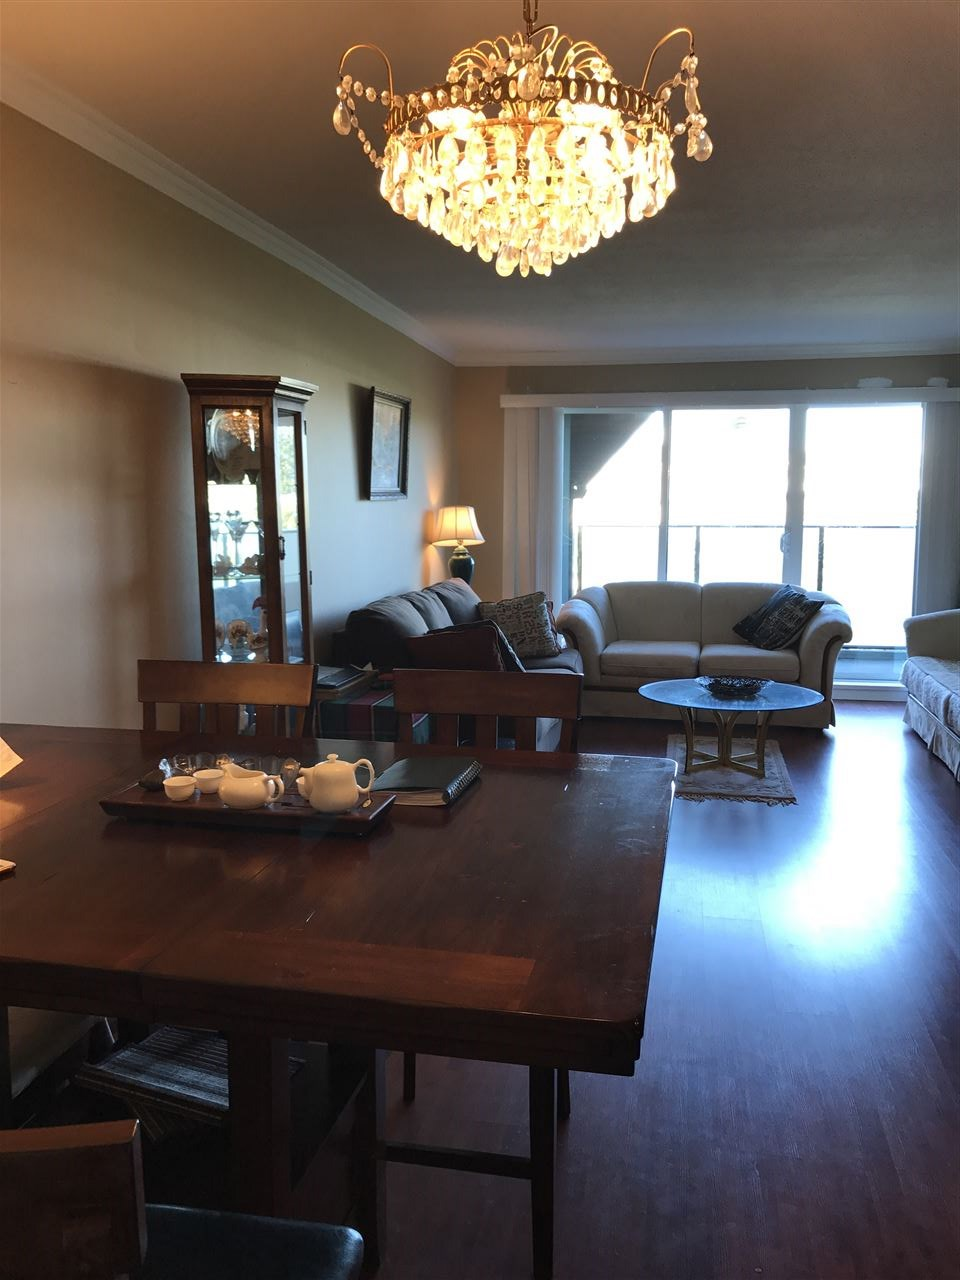 Condo Apartment at 306 1830 E SOUTHMERE CRESCENT, Unit 306, South Surrey White Rock, British Columbia. Image 1